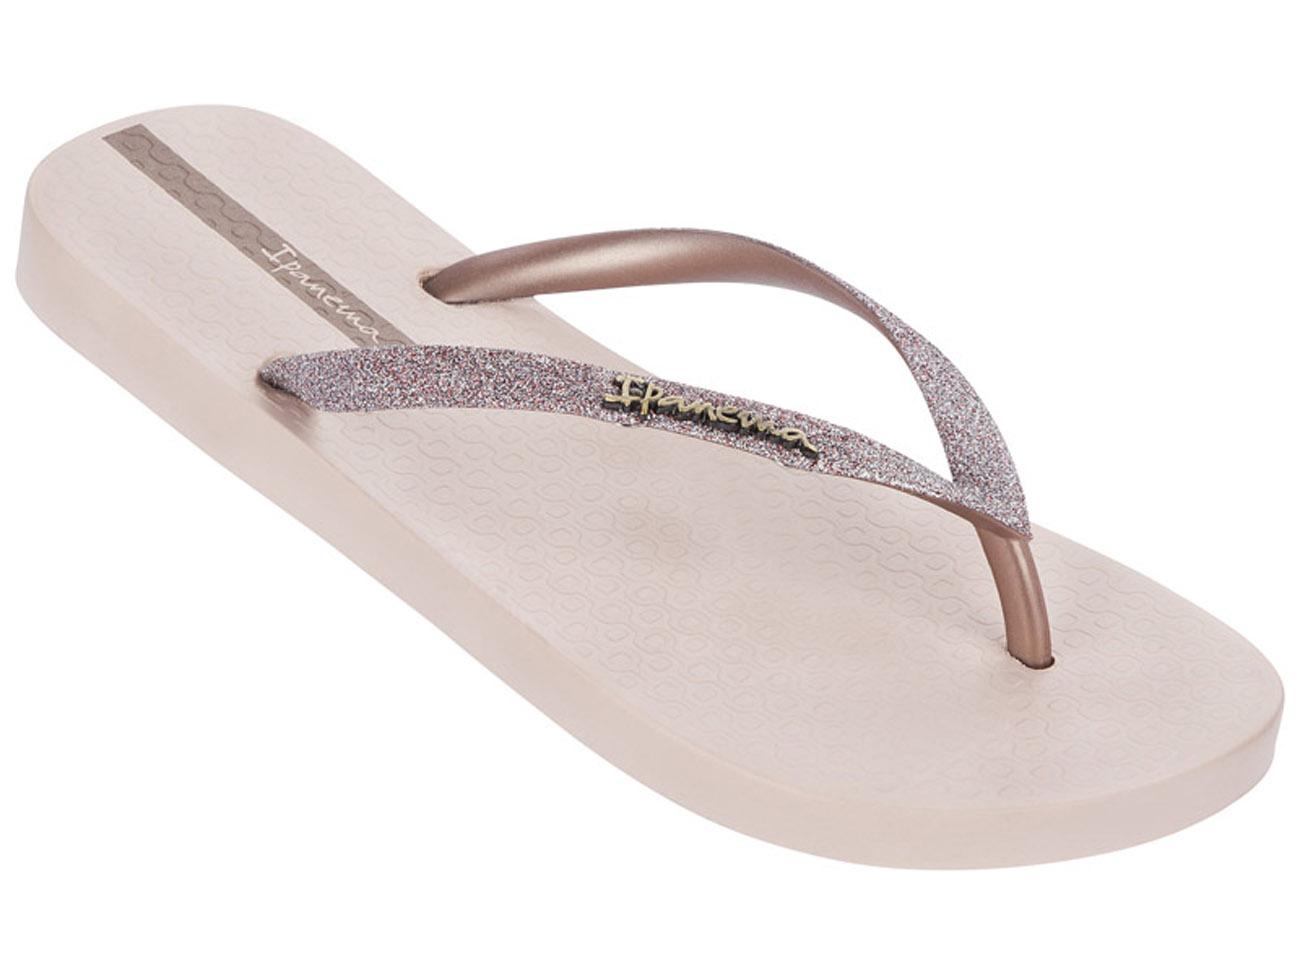 new ipanema sparkle glitter flip flops sandals beach gold. Black Bedroom Furniture Sets. Home Design Ideas